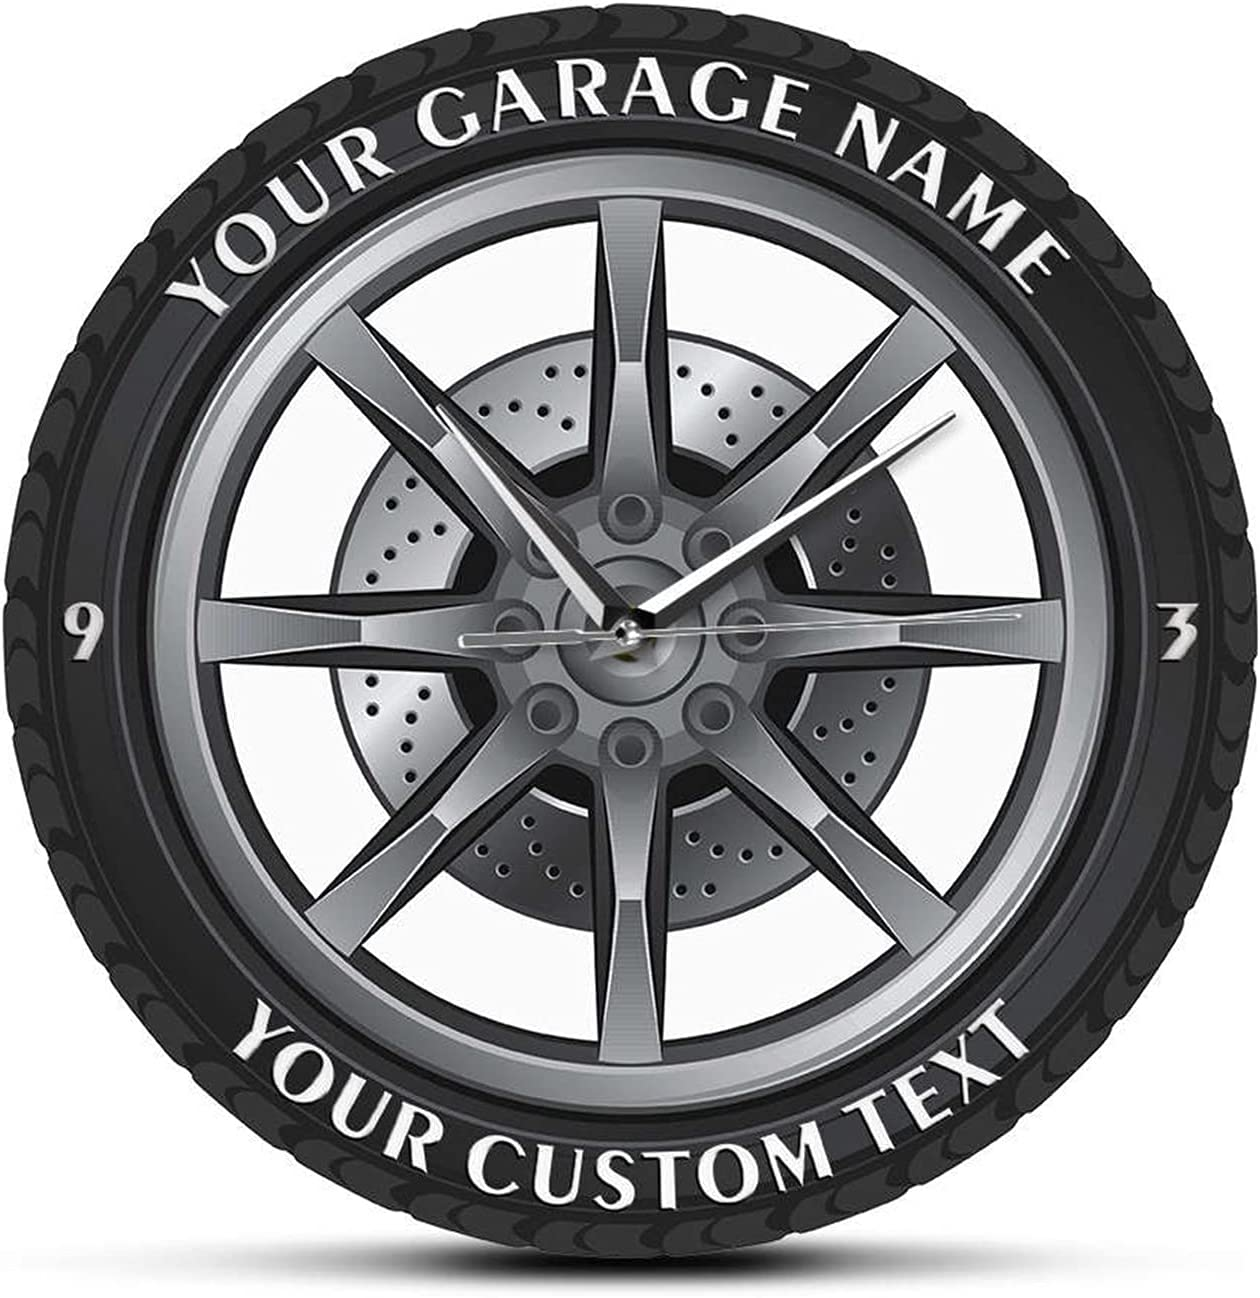 supreme JJYGTES Wall Clock Service Repair Baltimore Mall Tire Garage A Wheel